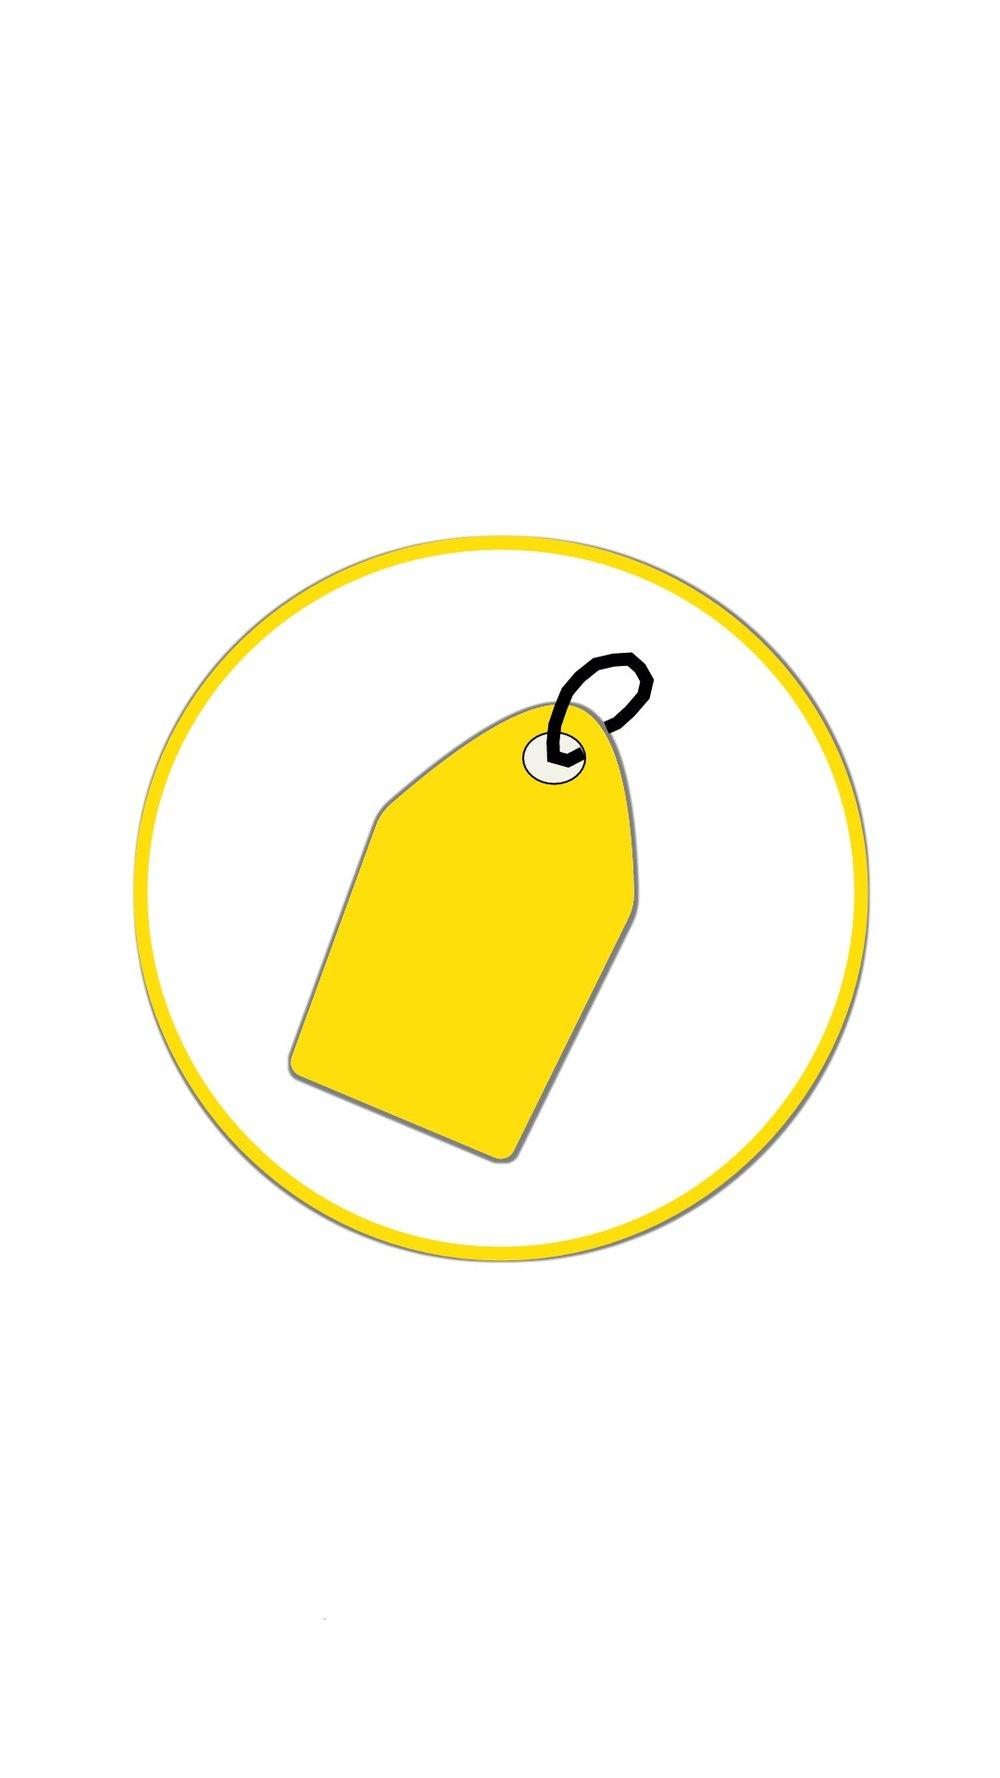 Instagram-cover-tag-yellow-white-lotnotes.com.jpg